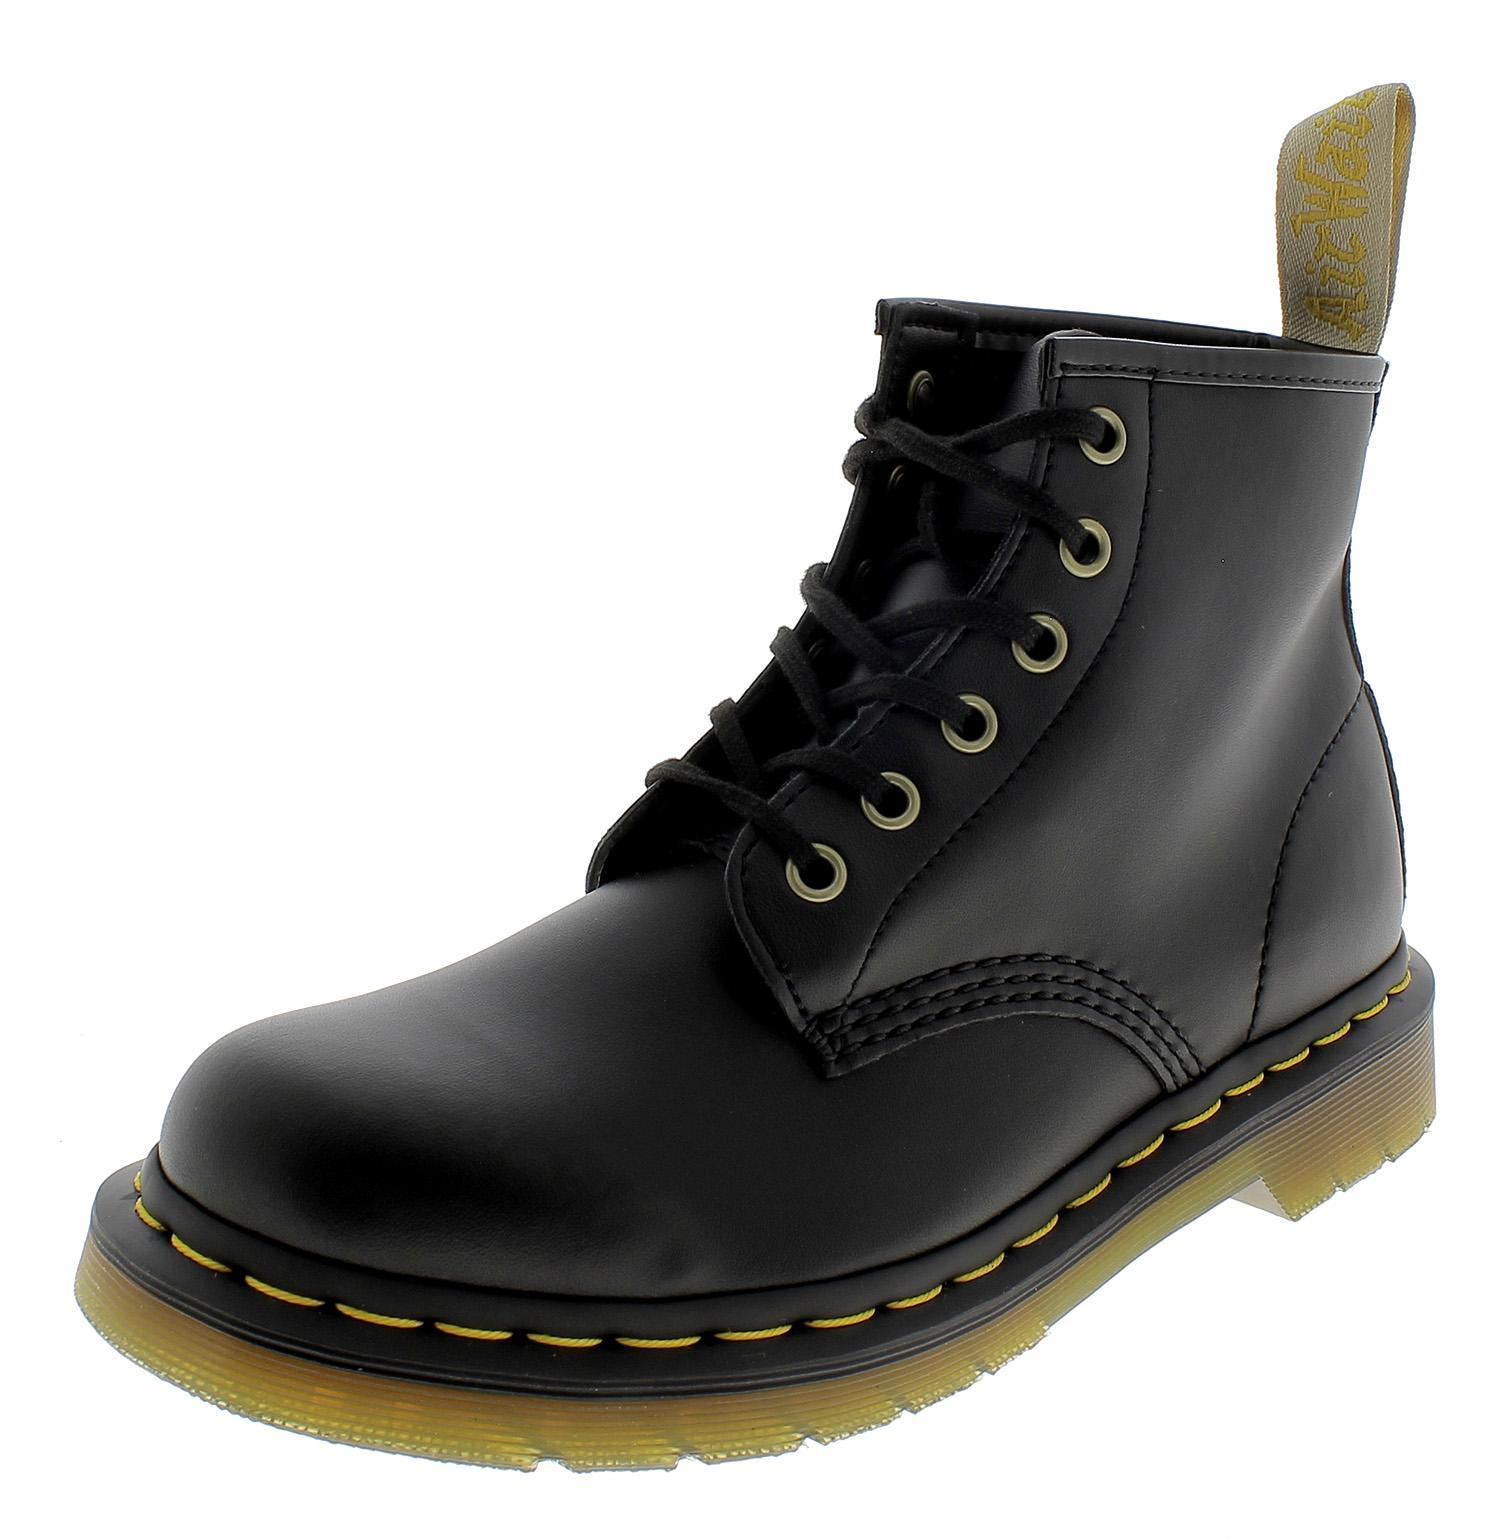 DR. MARTENS VEGAN WOMAN'S BLACK BOOTS 23984001| | AliExpress